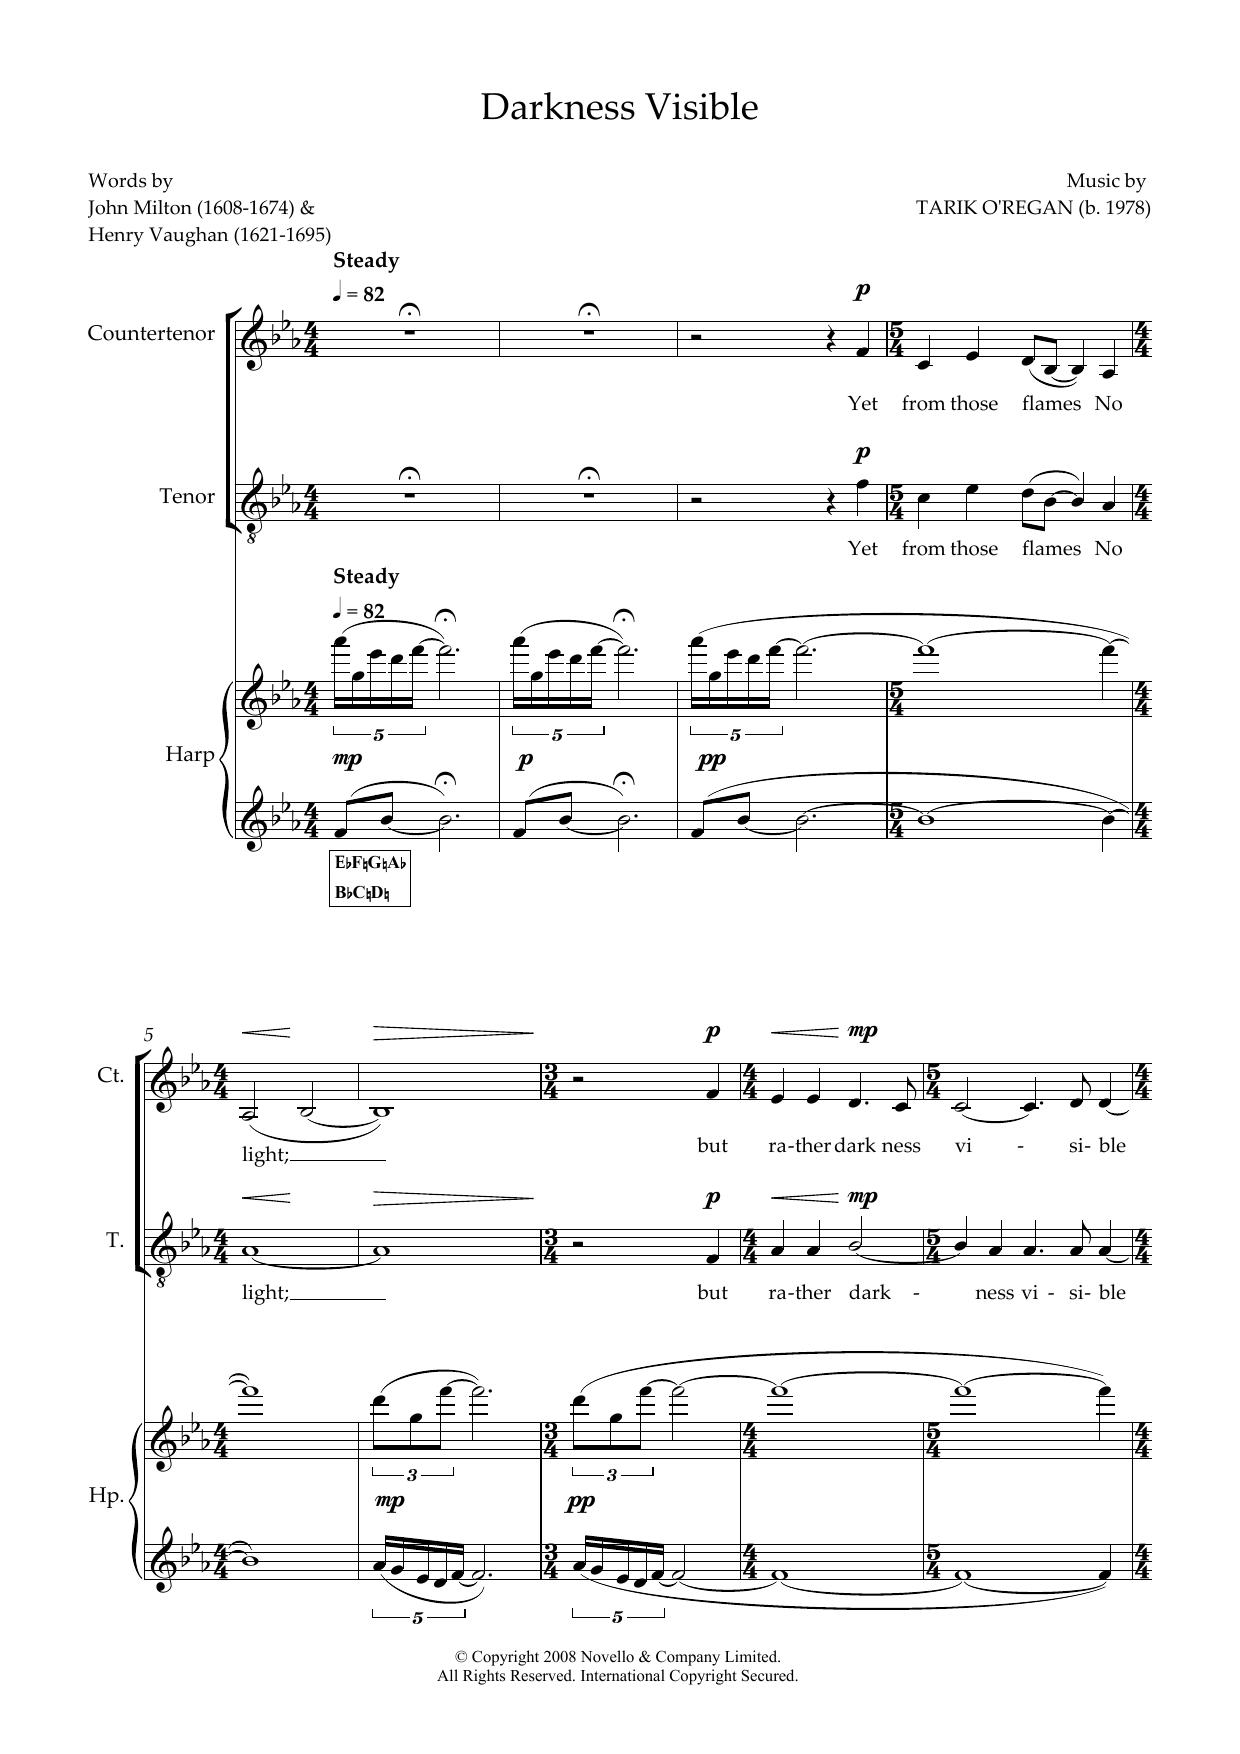 Darkness Visible (for counter-tenor, tenor & harp) Sheet Music